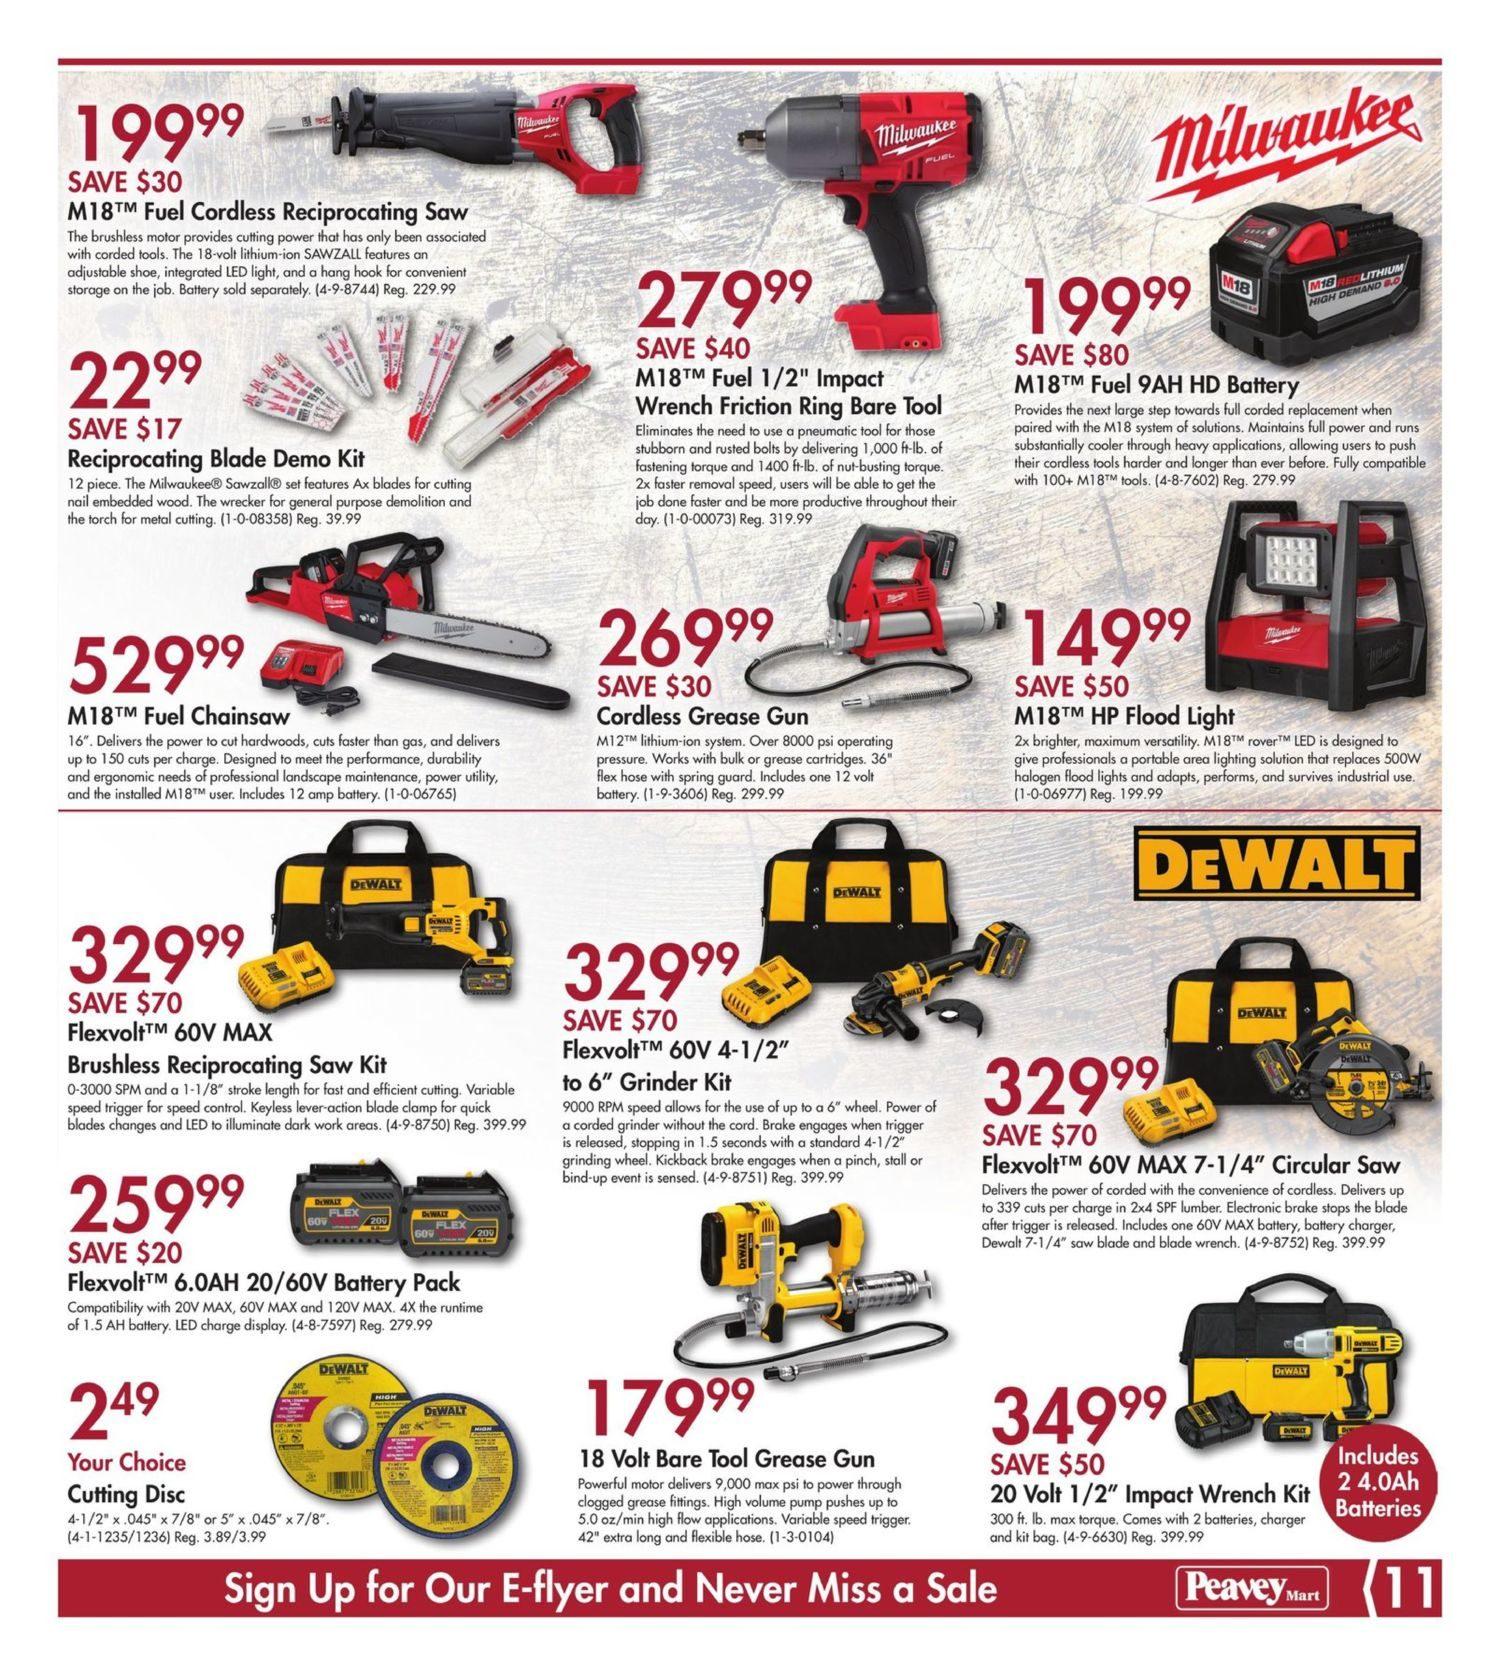 PeaveyMart Weekly Flyer - Christmas Gift Ideas - Nov 30 – Dec 10